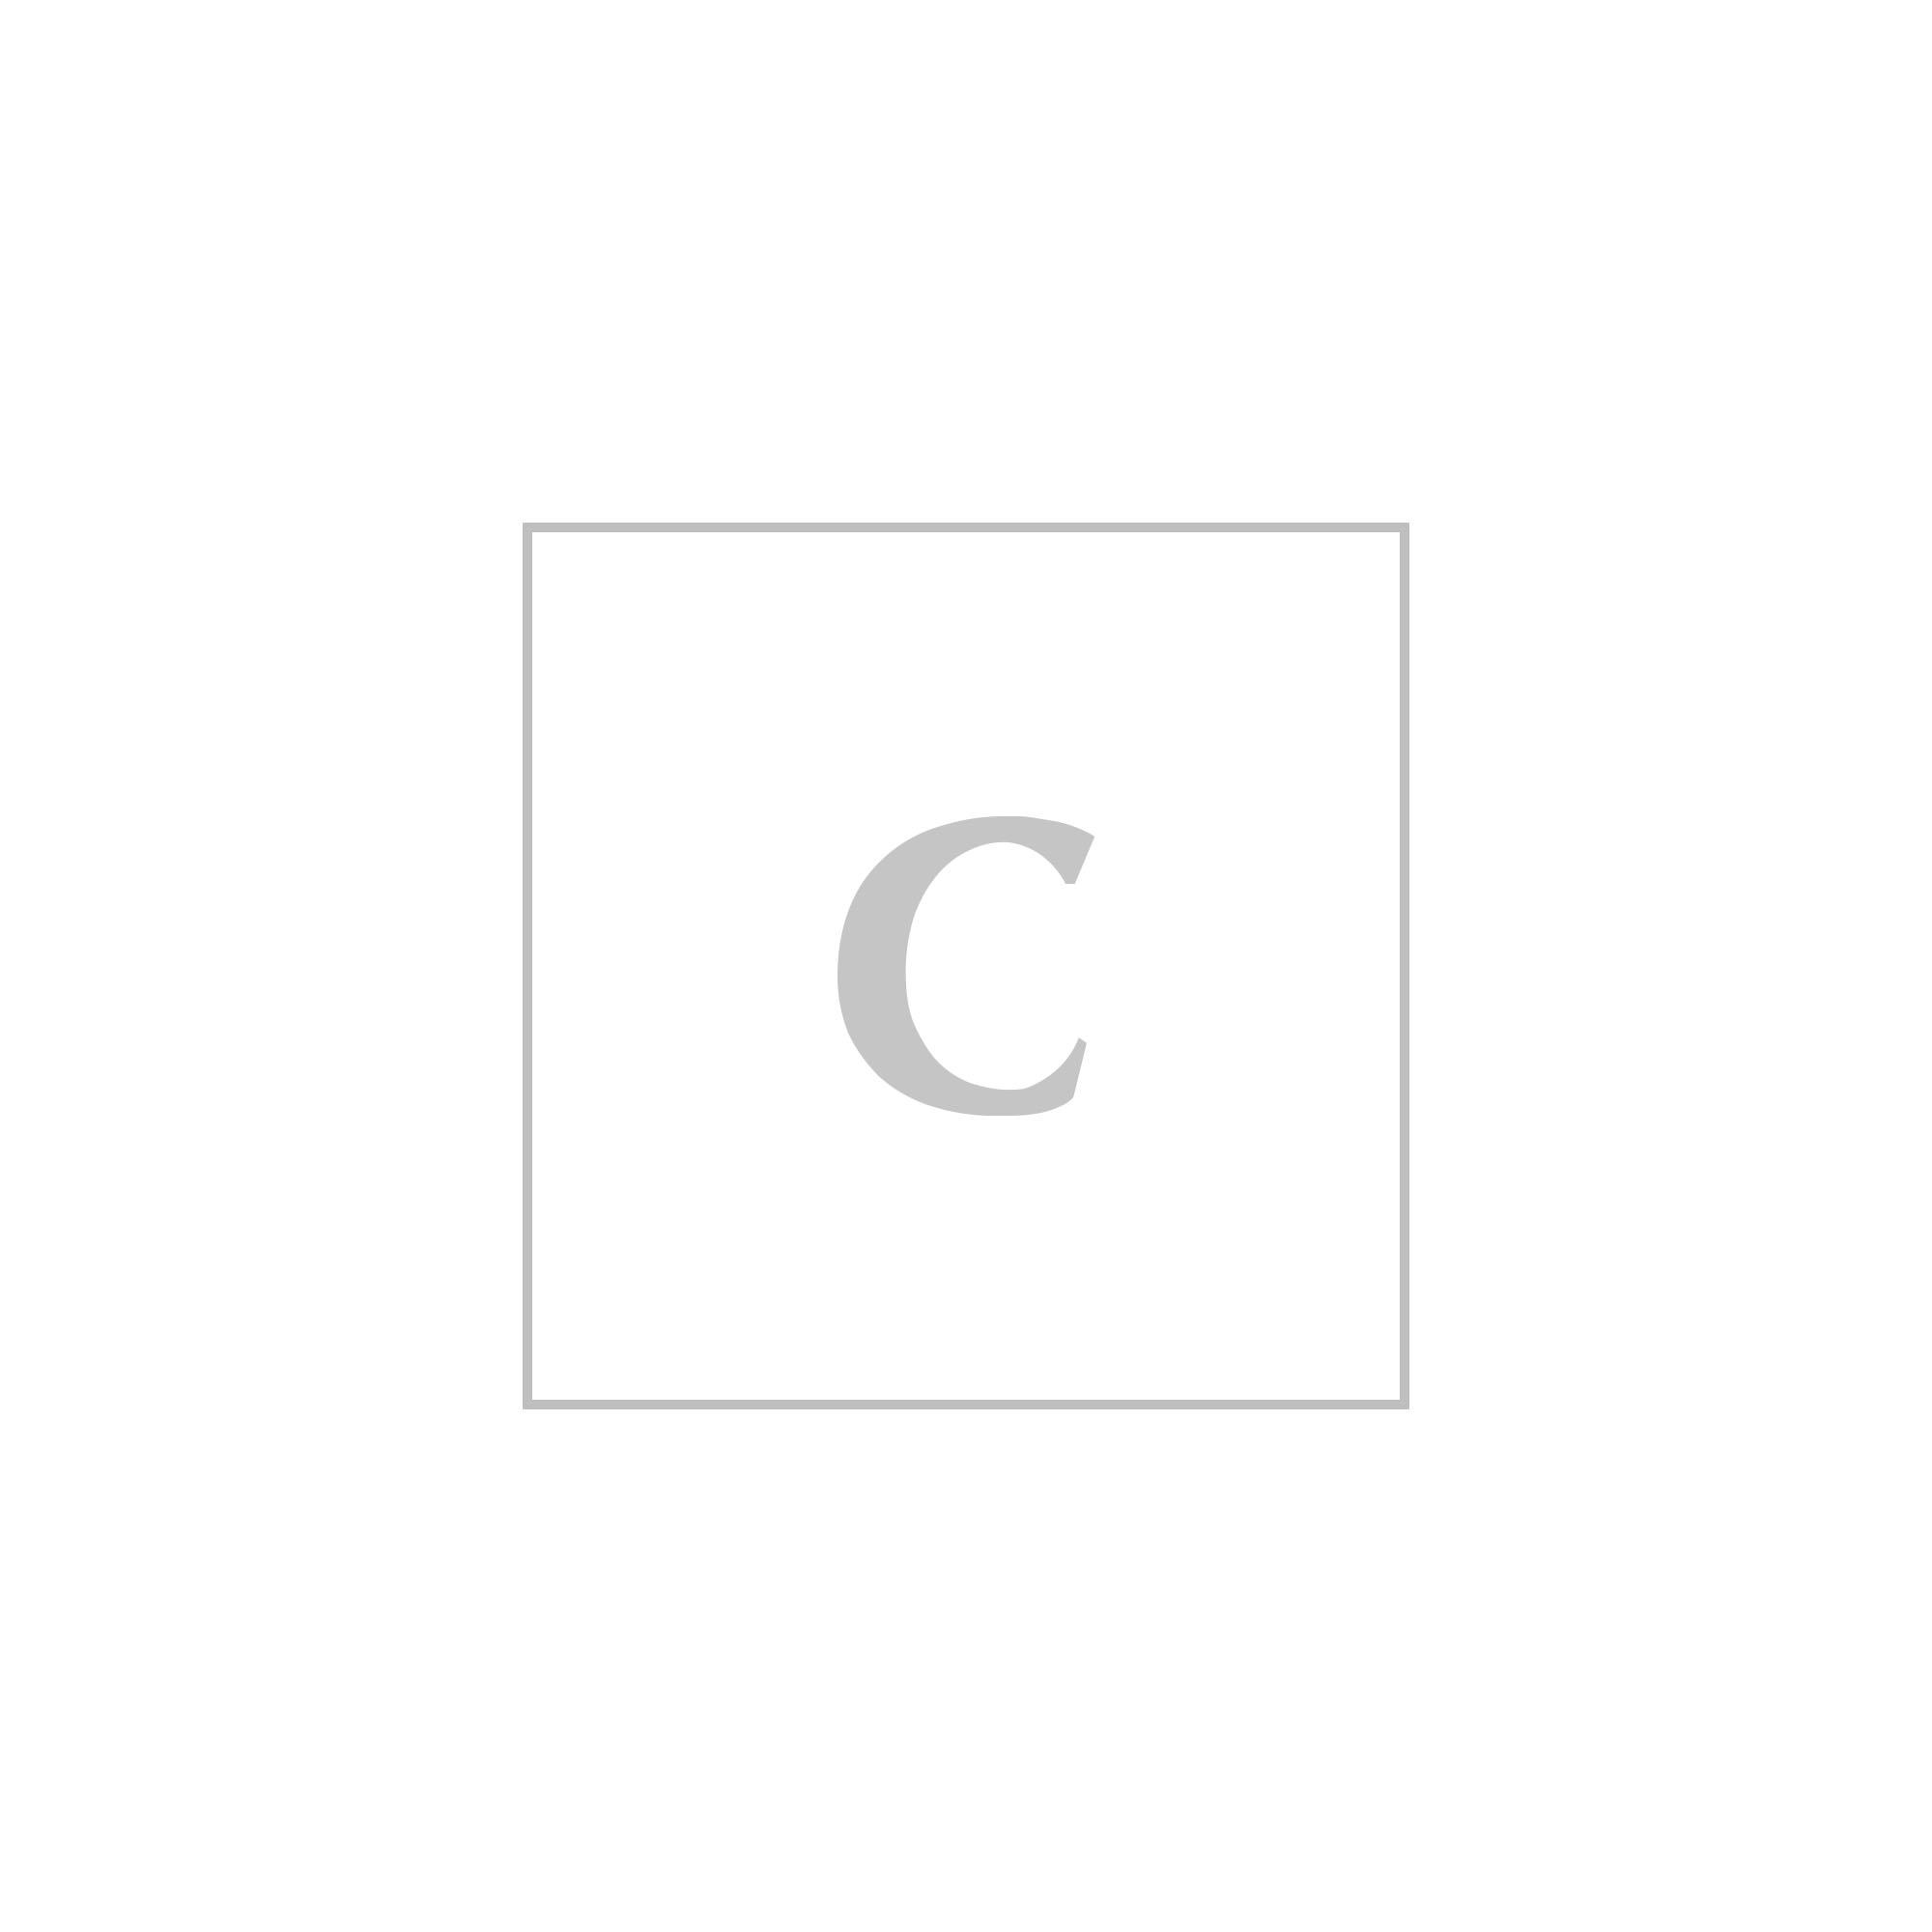 Dolce & gabbana rubber slides with logo